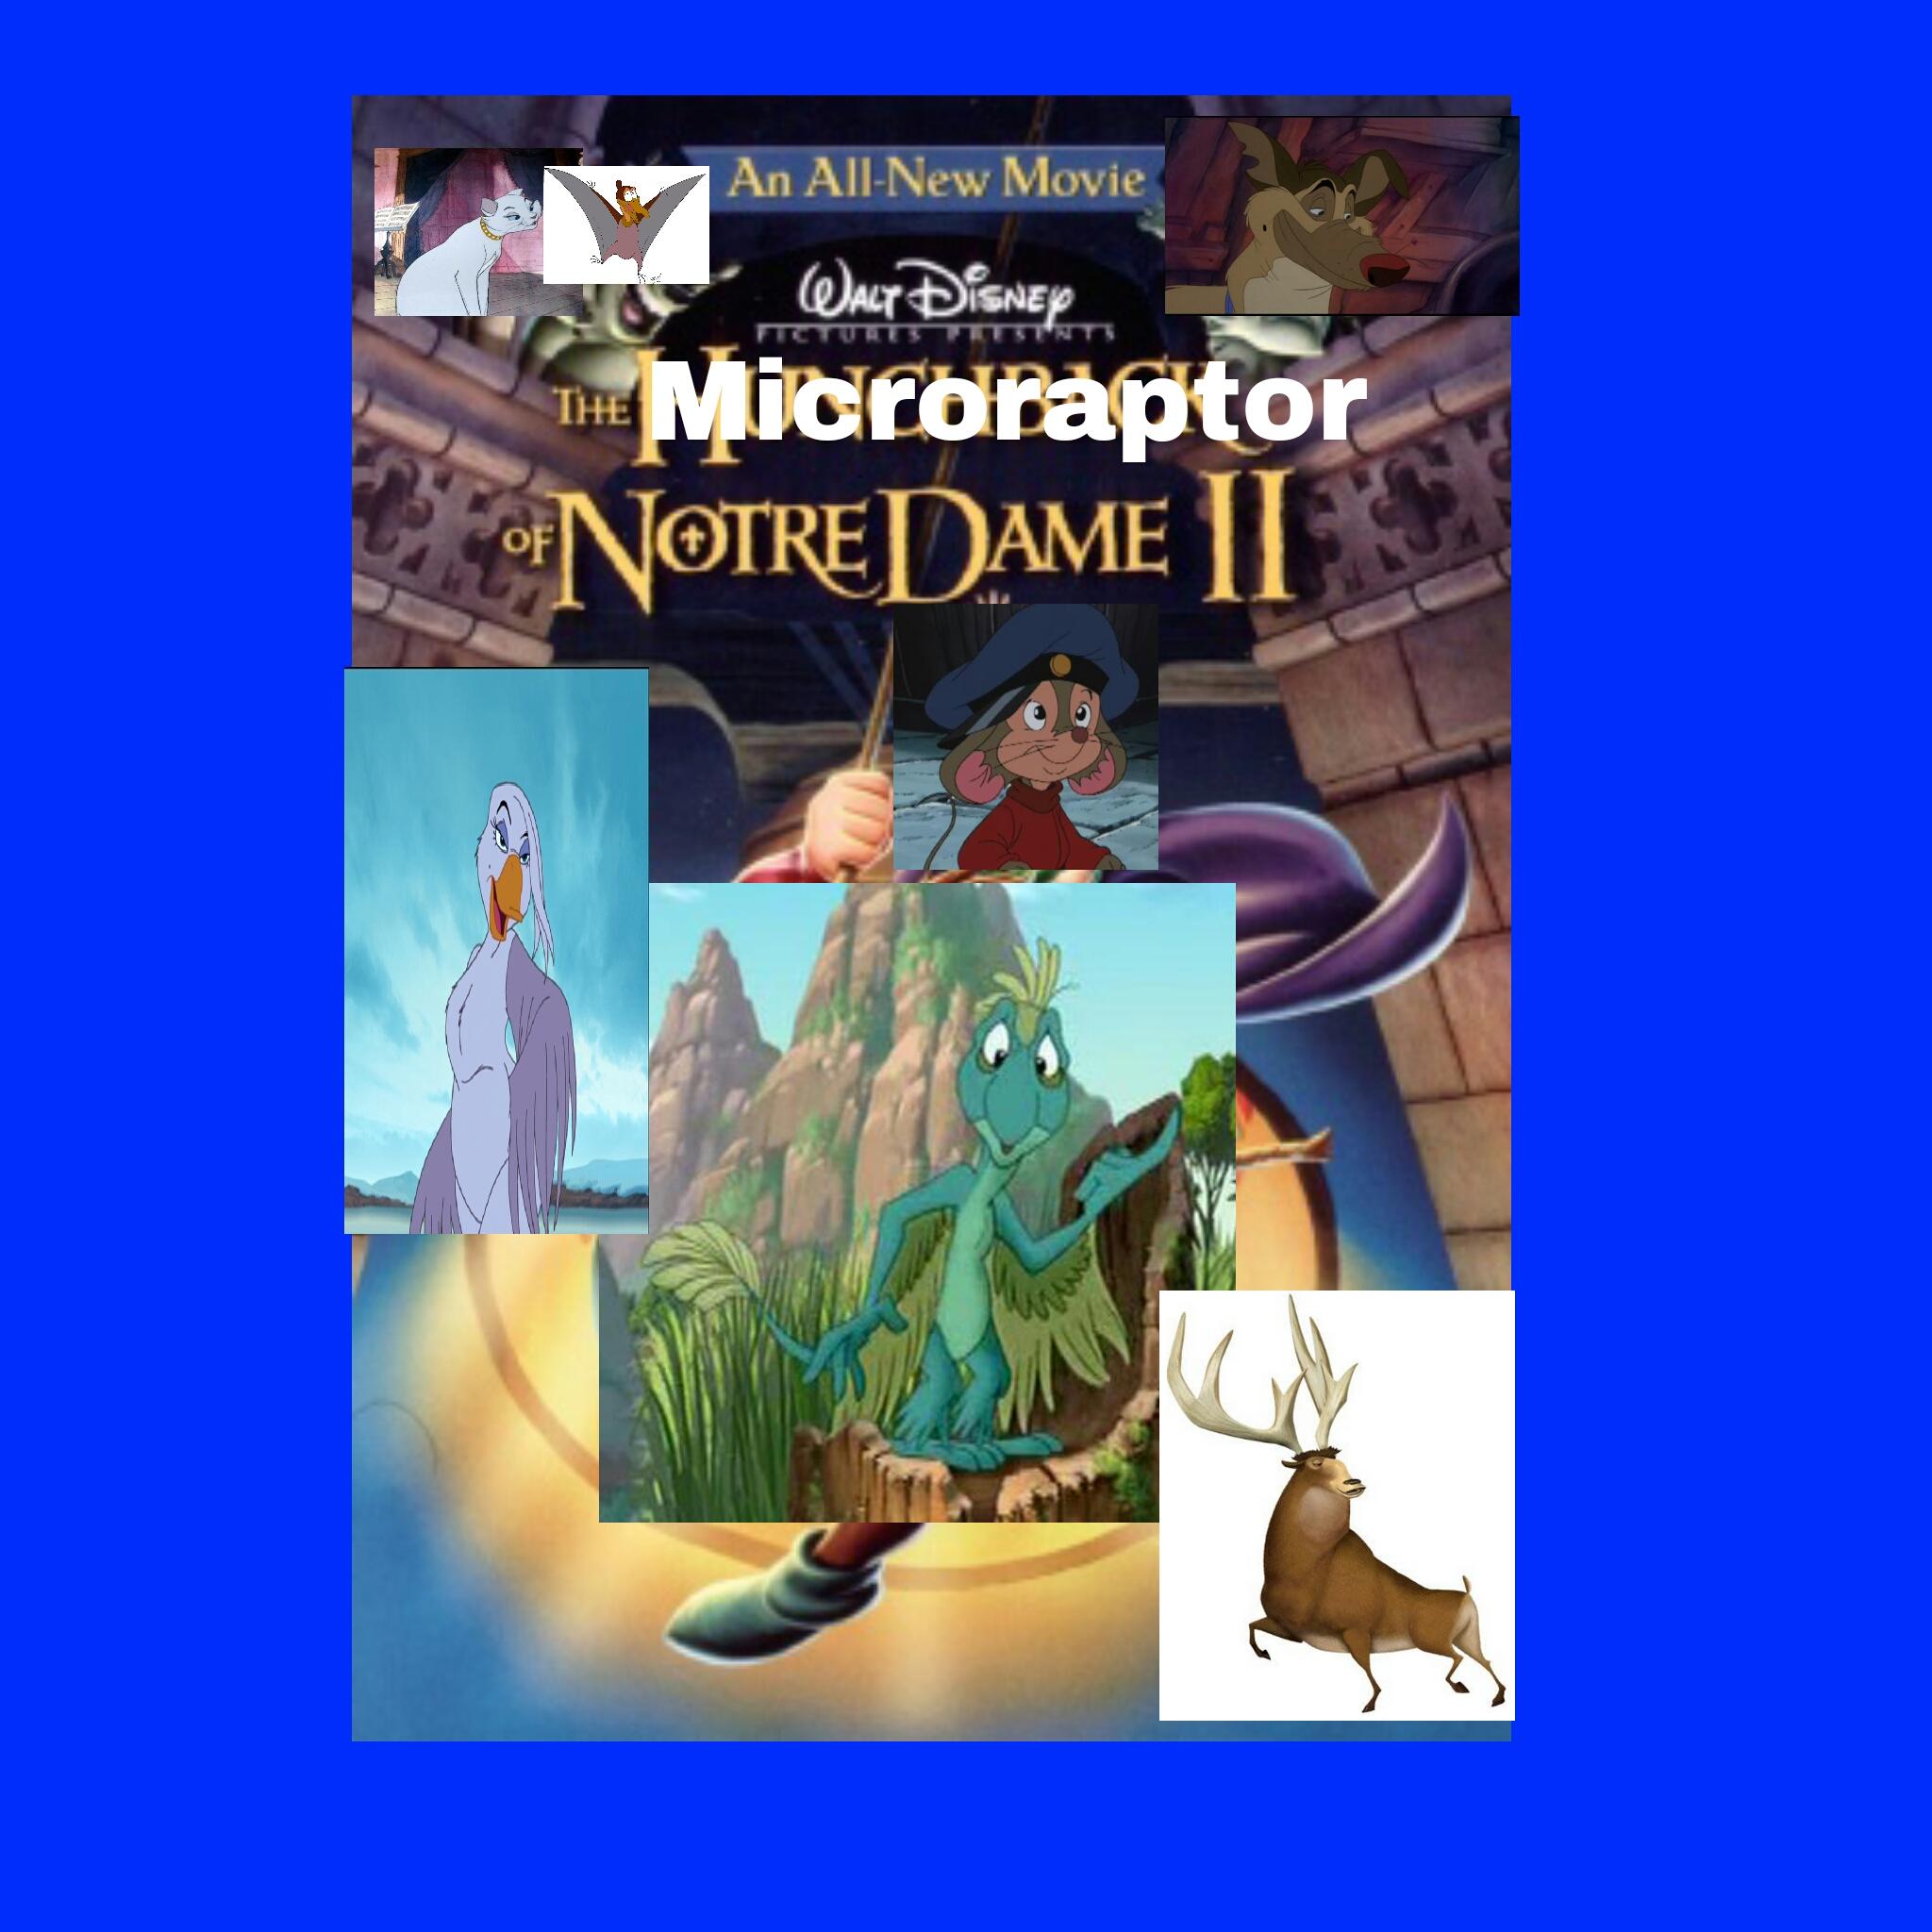 The Microraptor of Notre Dame 2